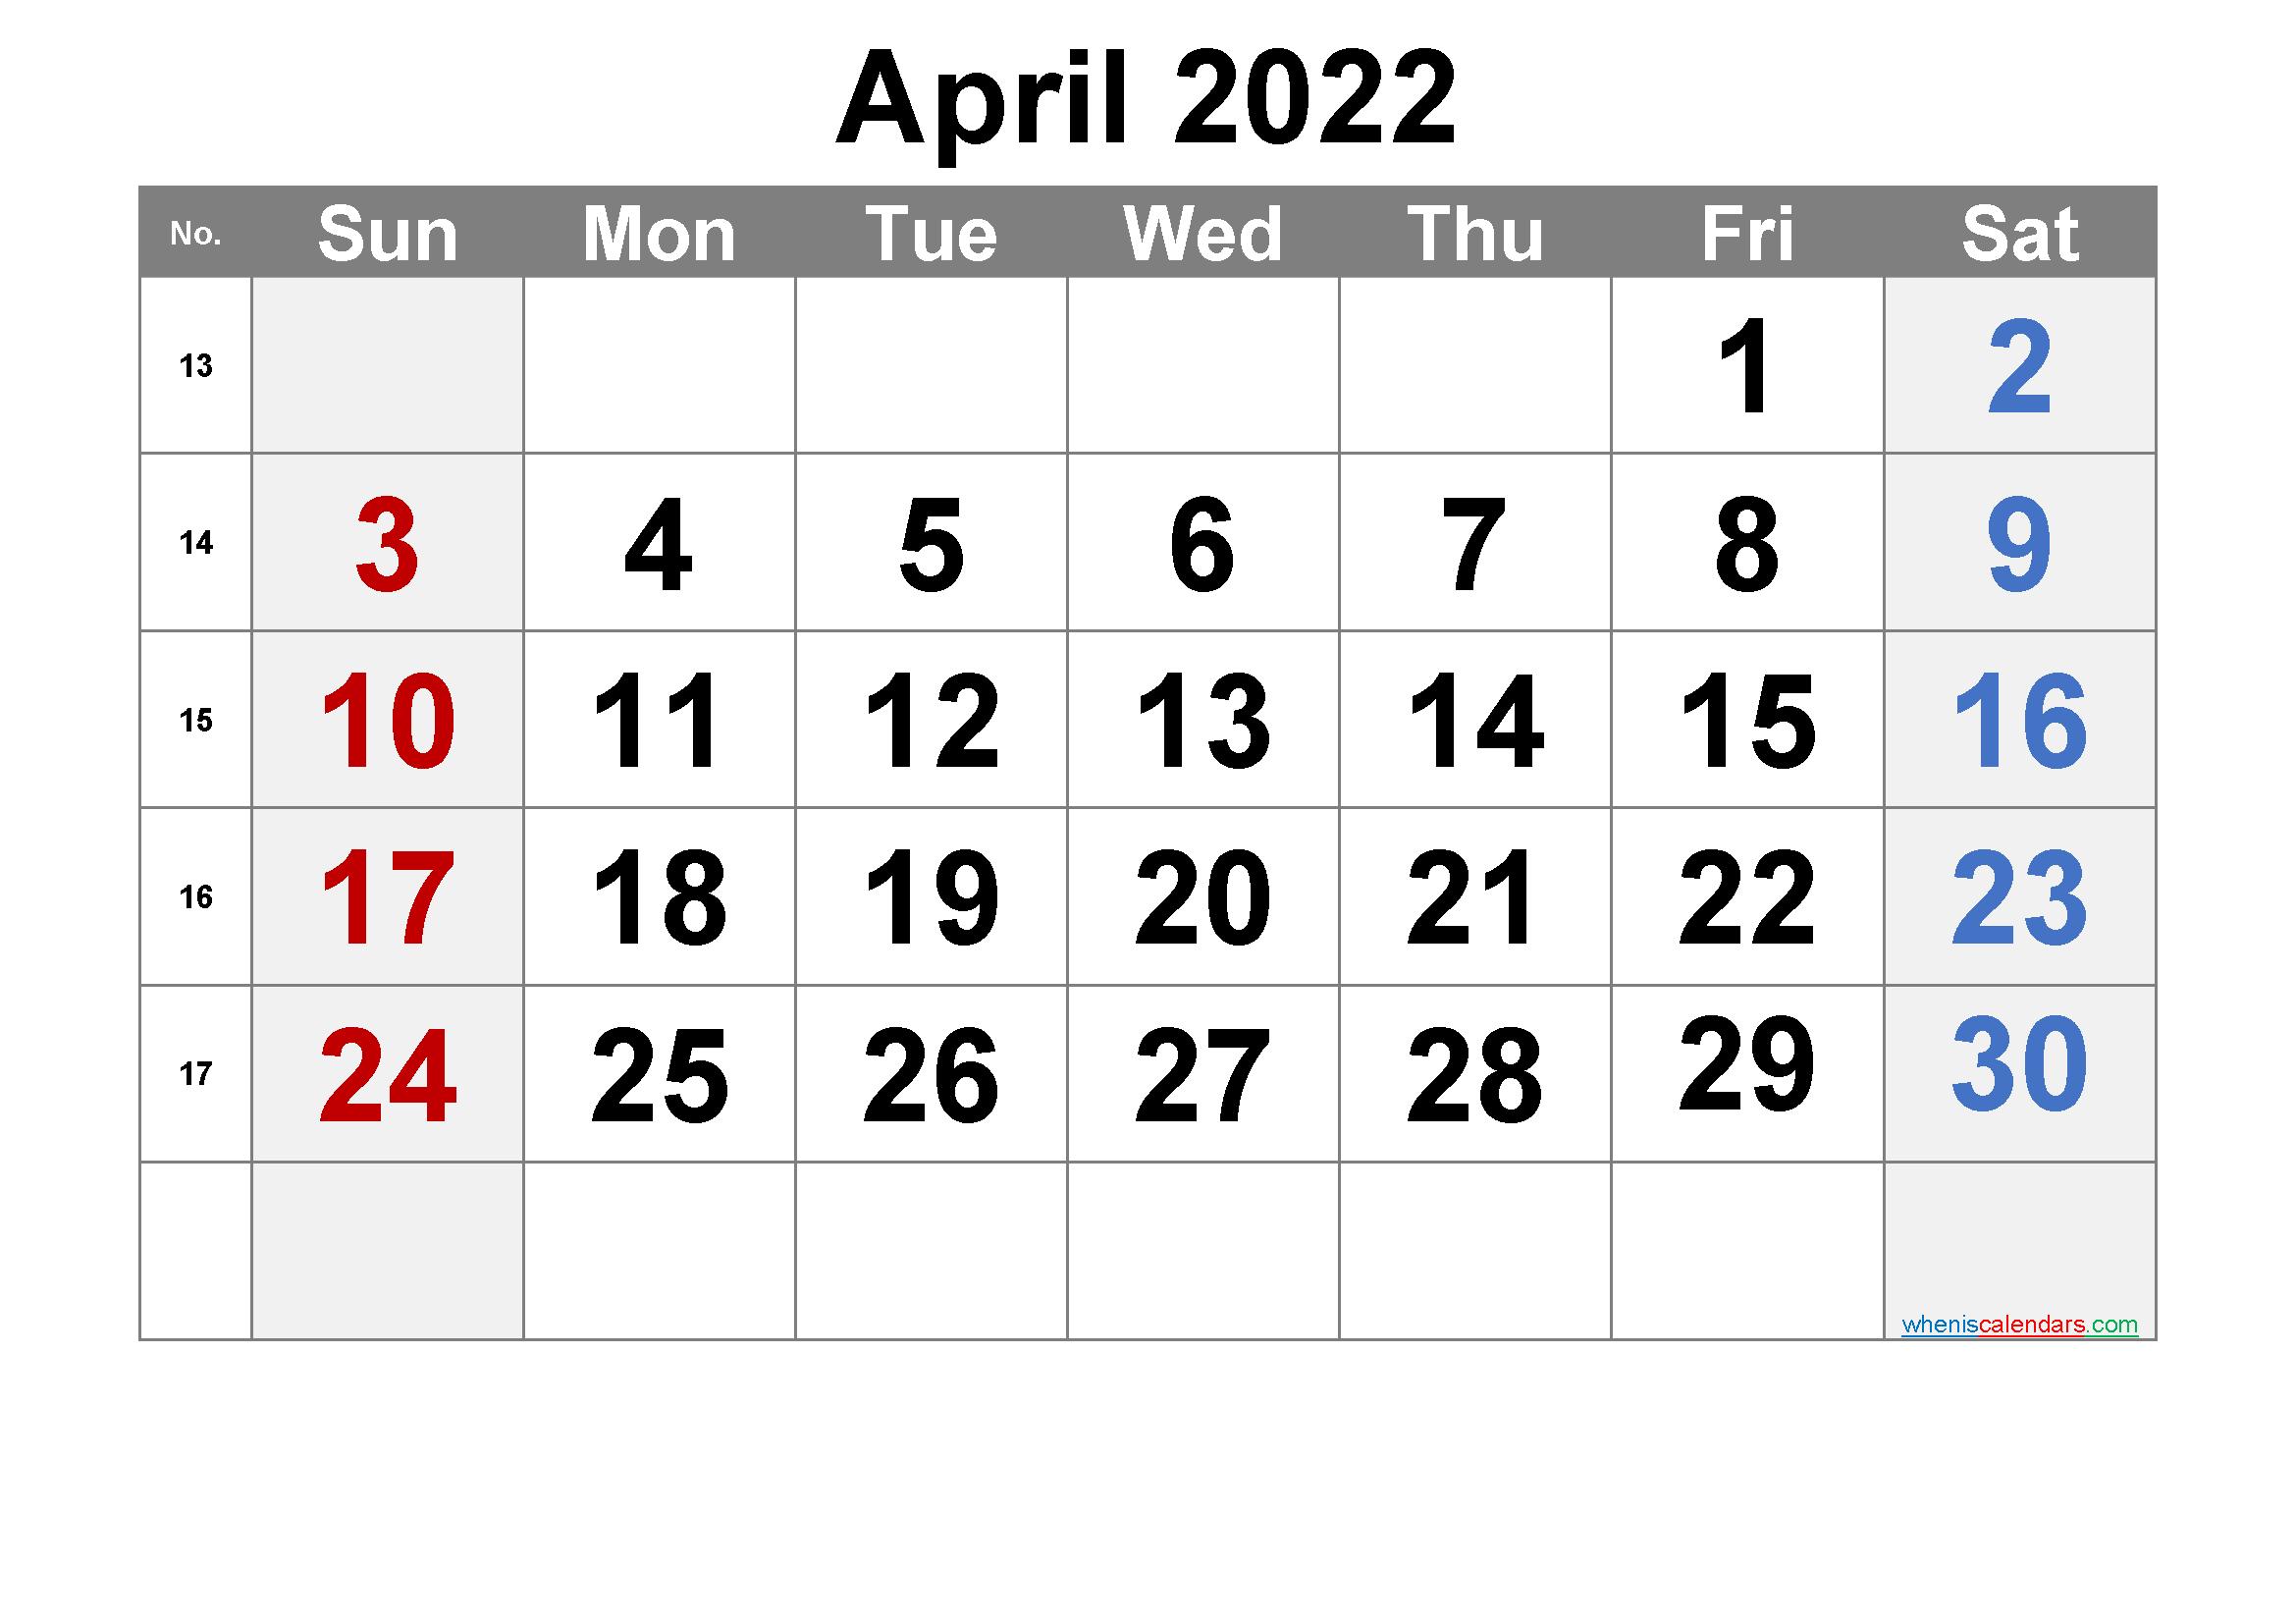 Free April 2022 Calendar With Week Numbers - Free regarding Blank Calendar Printable April 2022 Graphics